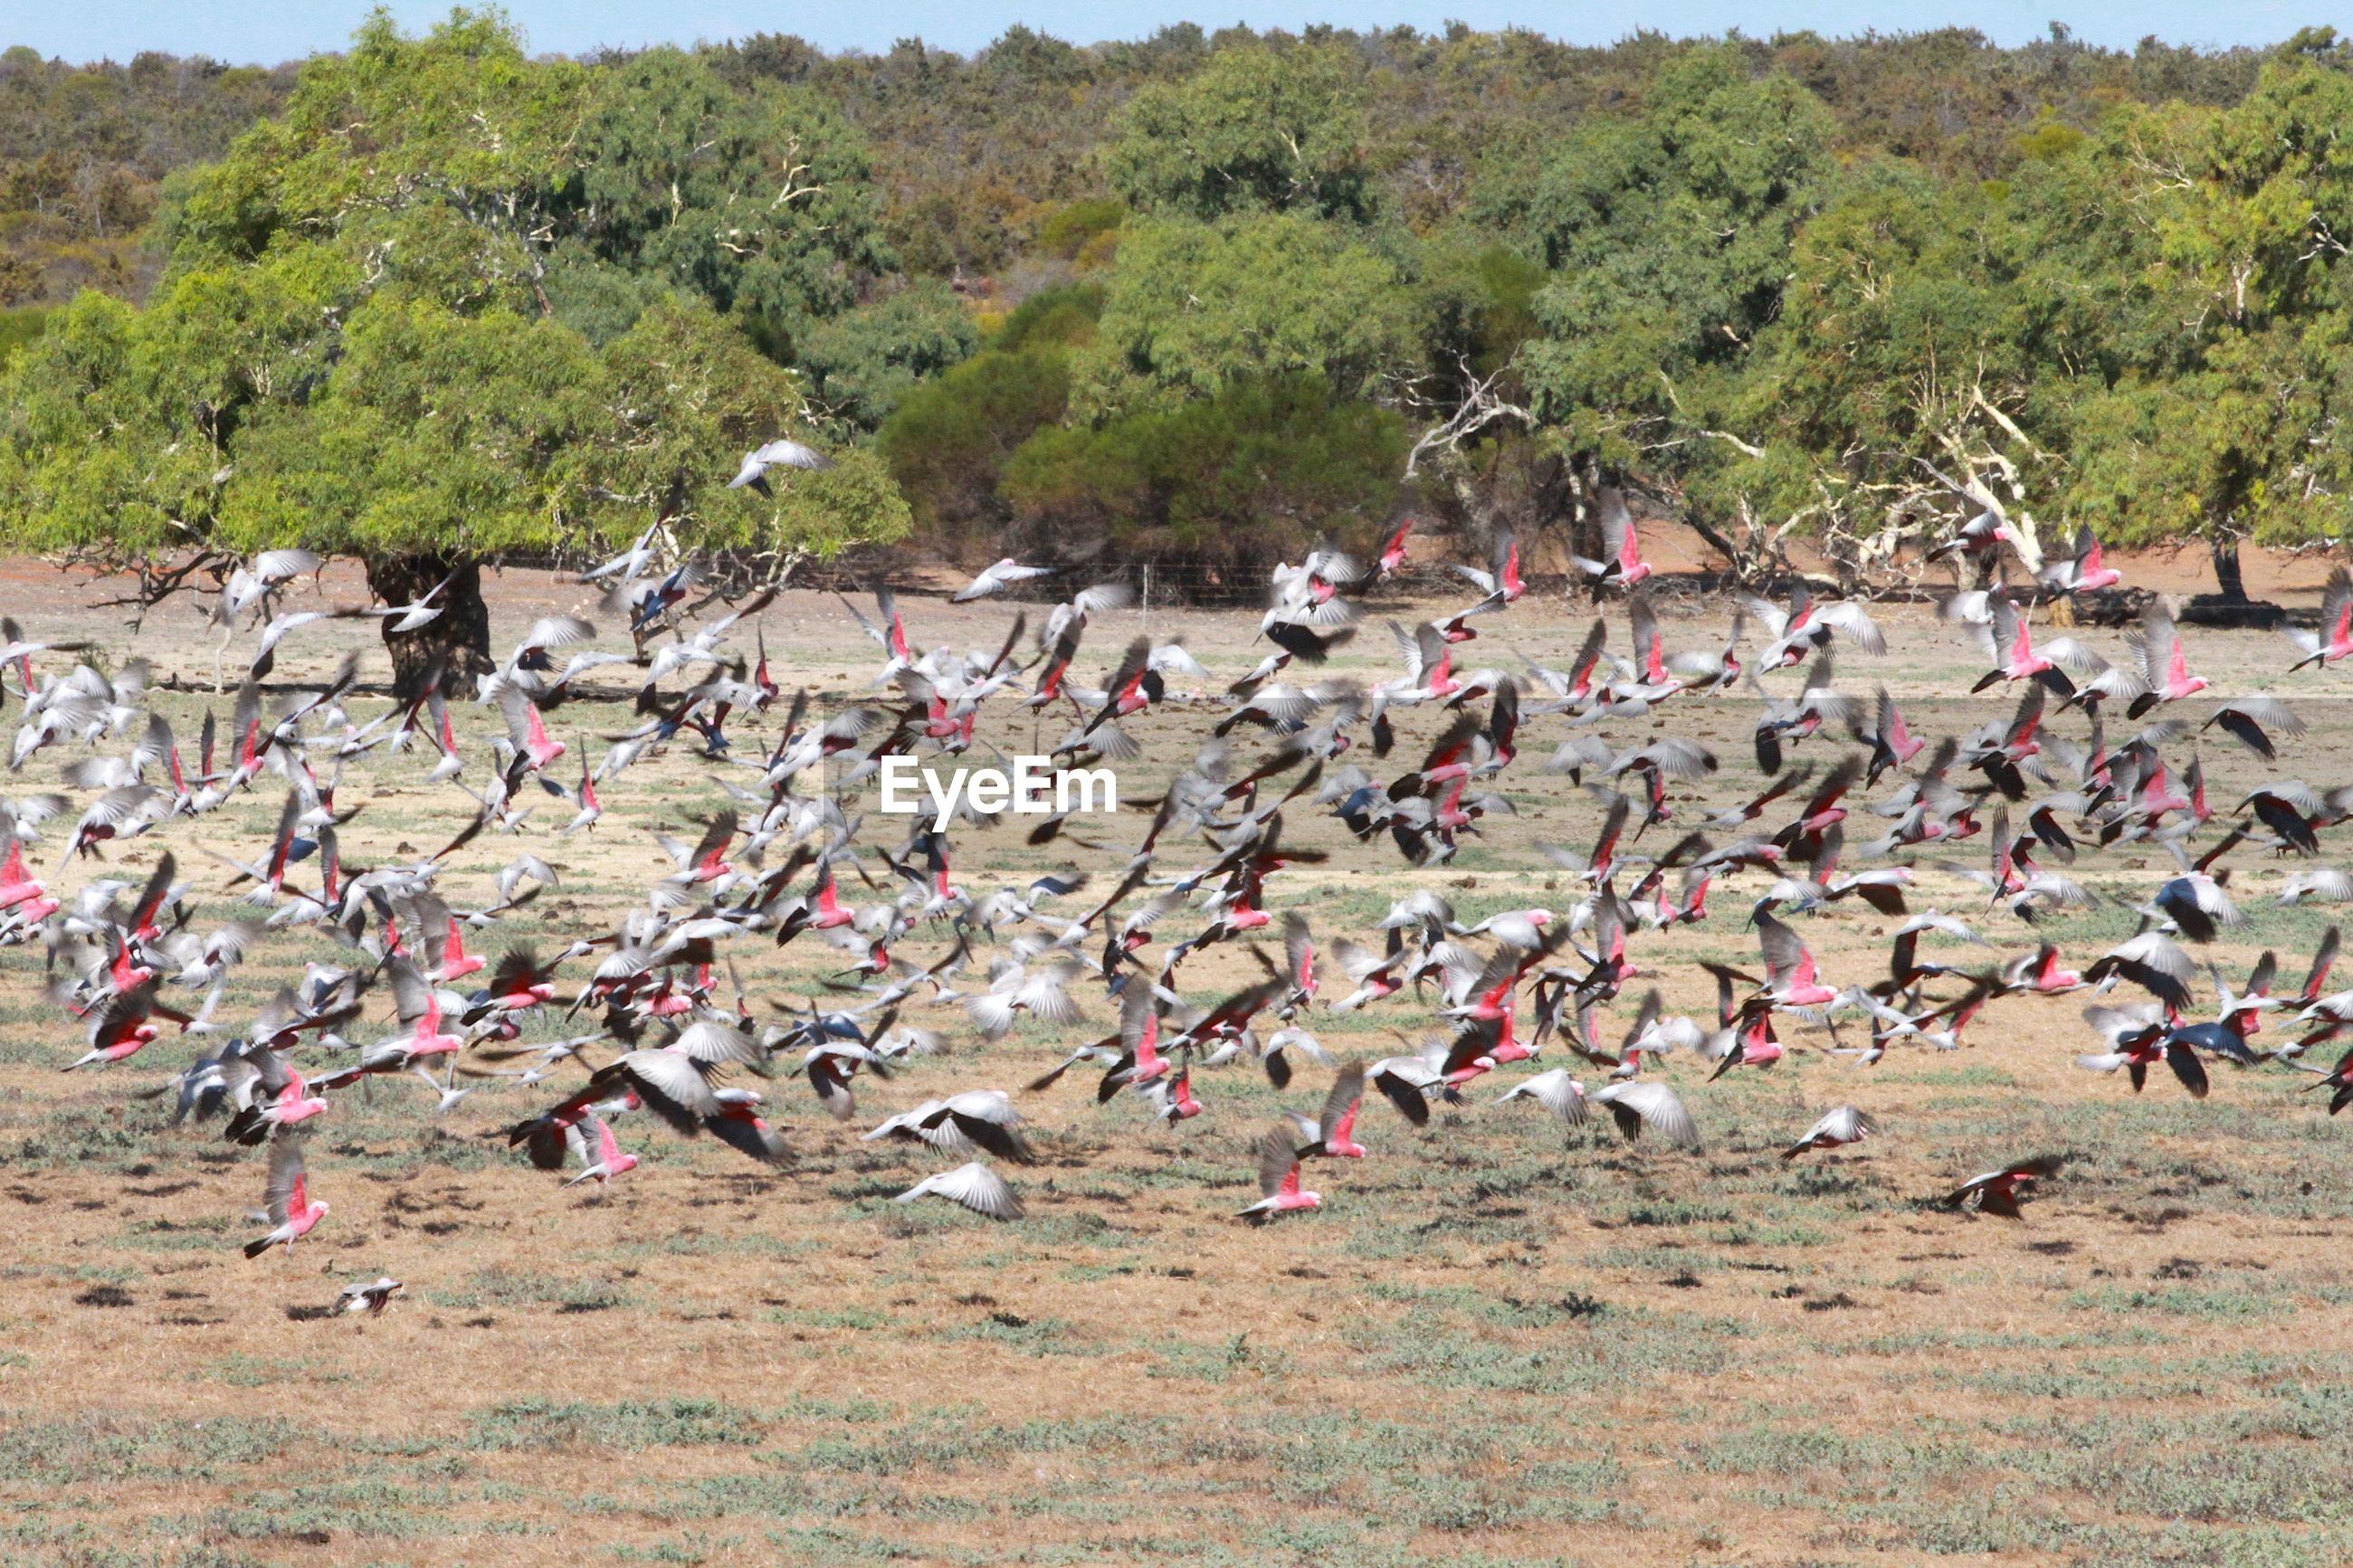 FLOCK OF BIRDS FLYING OVER TREES